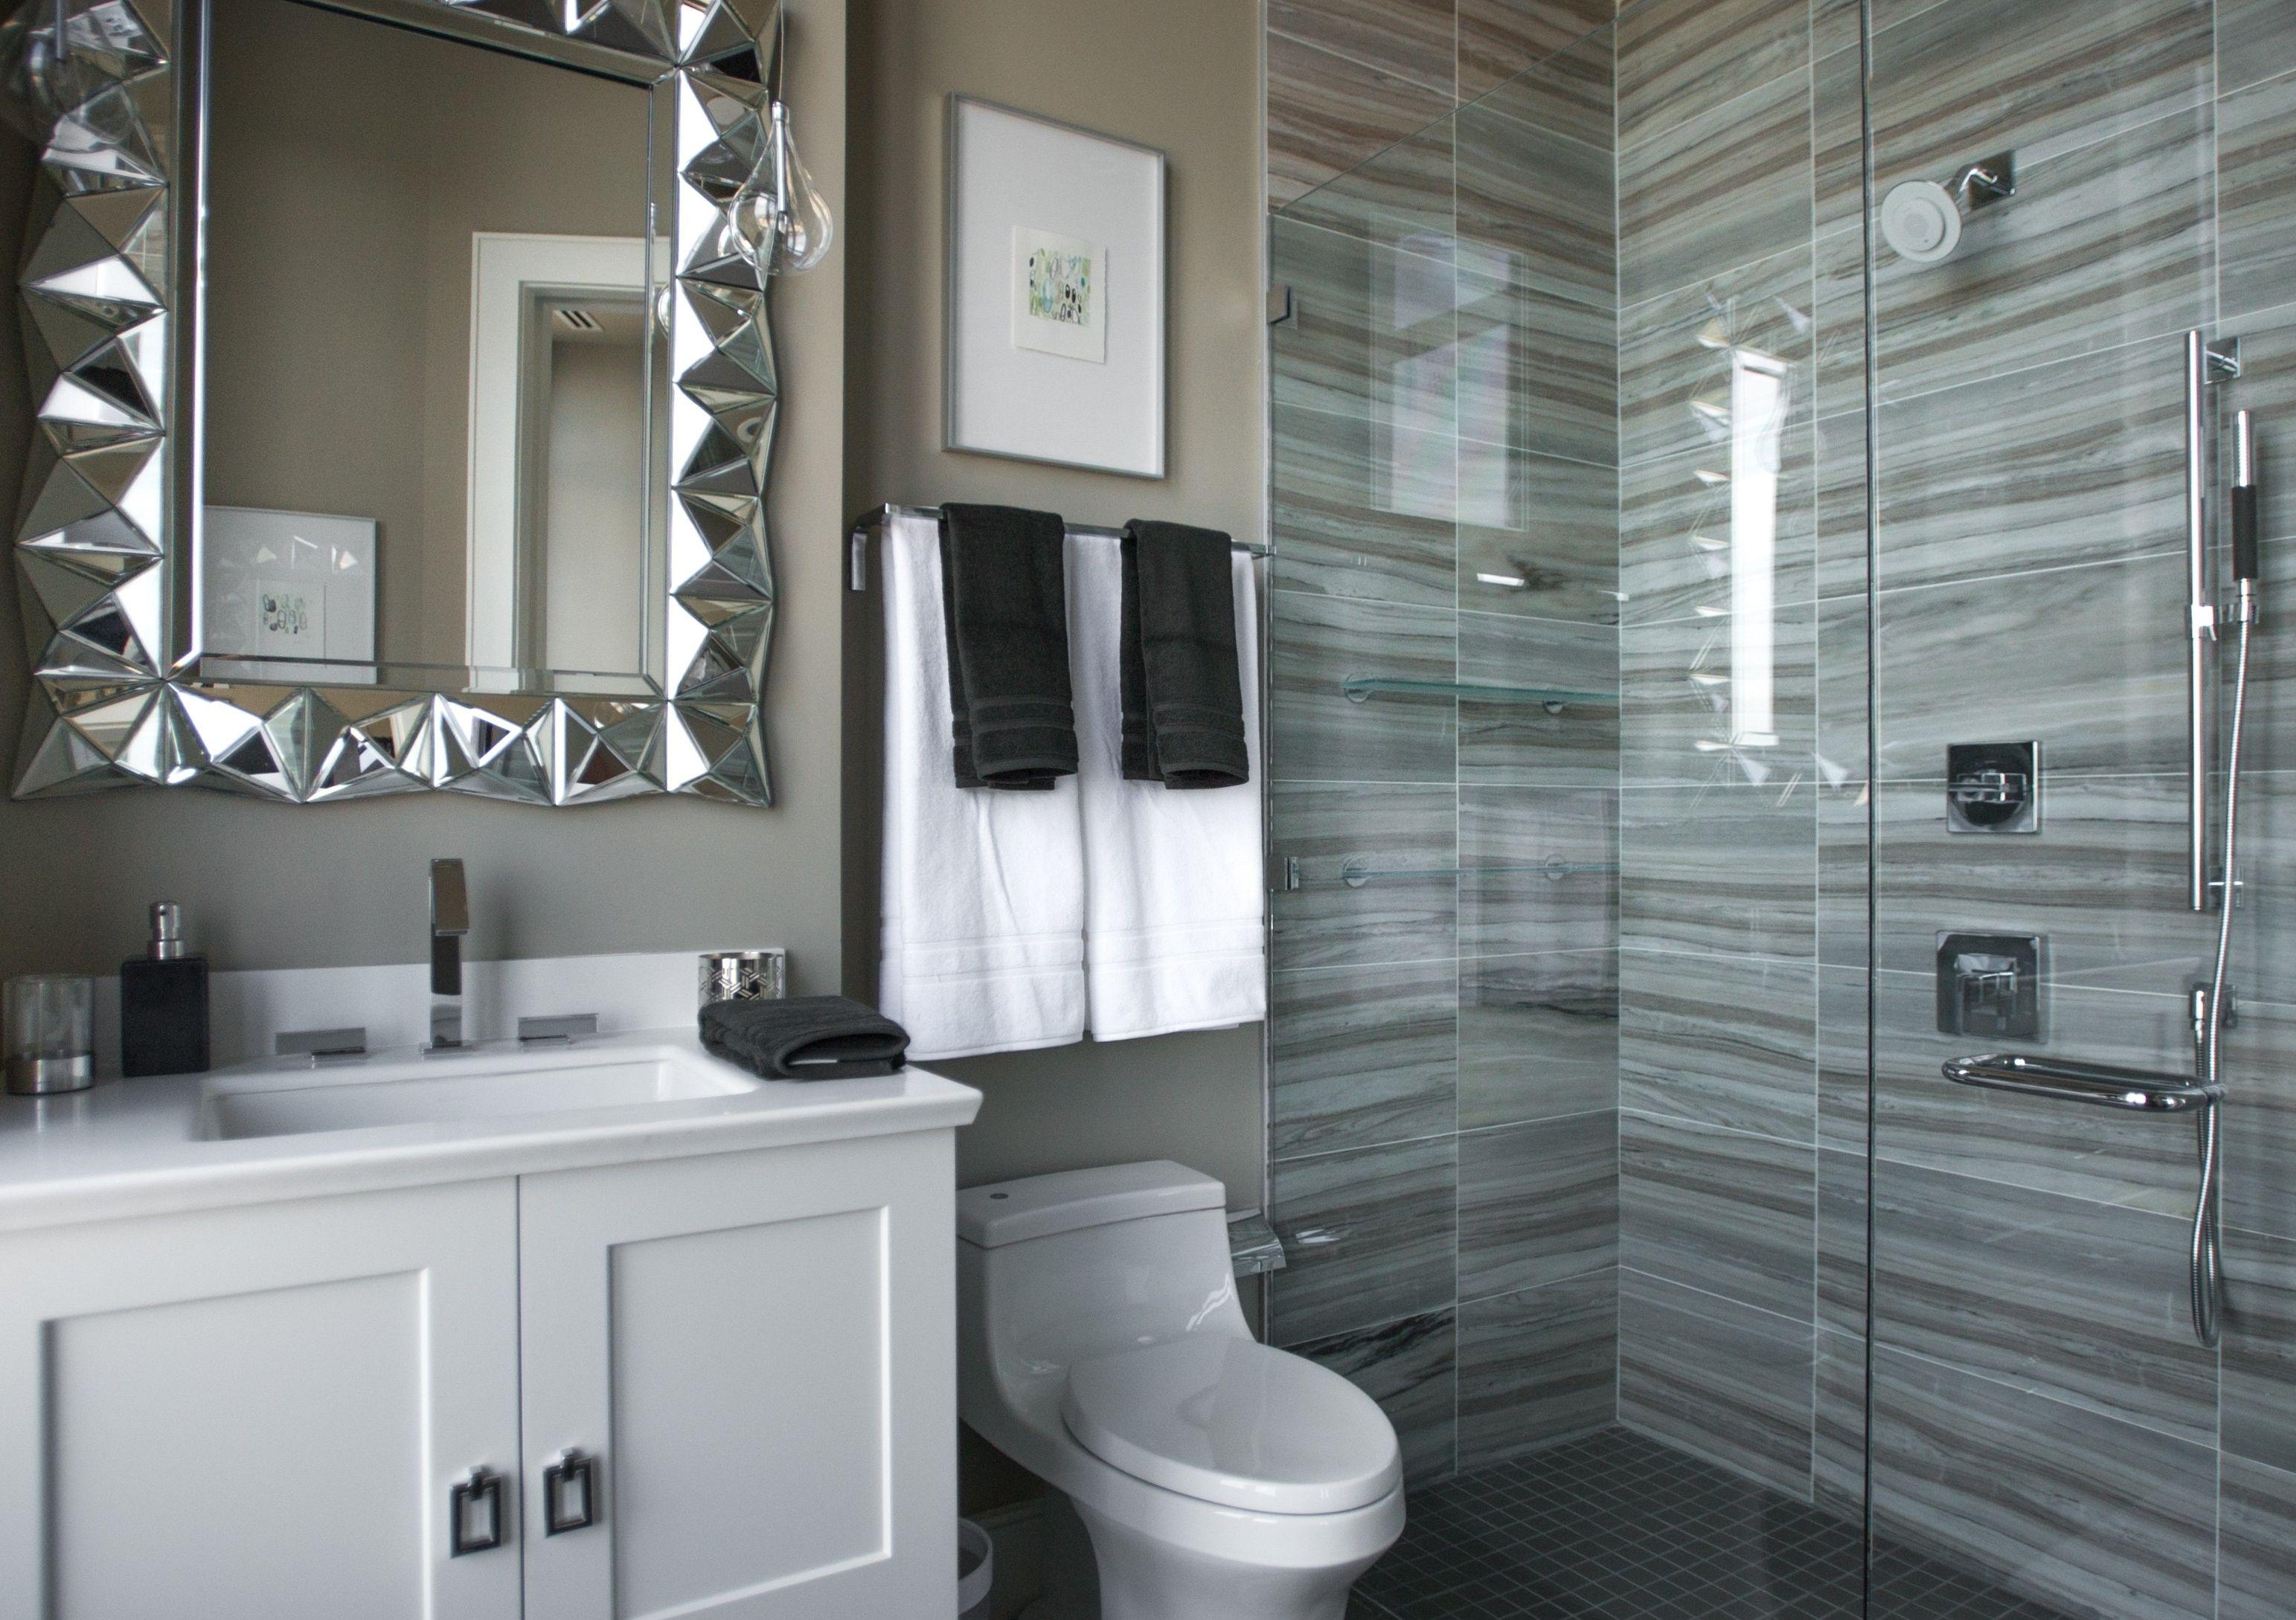 Impress Your Visitors With These 14 Cute Half Bathroom Designs Guest Bathroom Design Eclectic Bathroom Bathroom Decor Themes